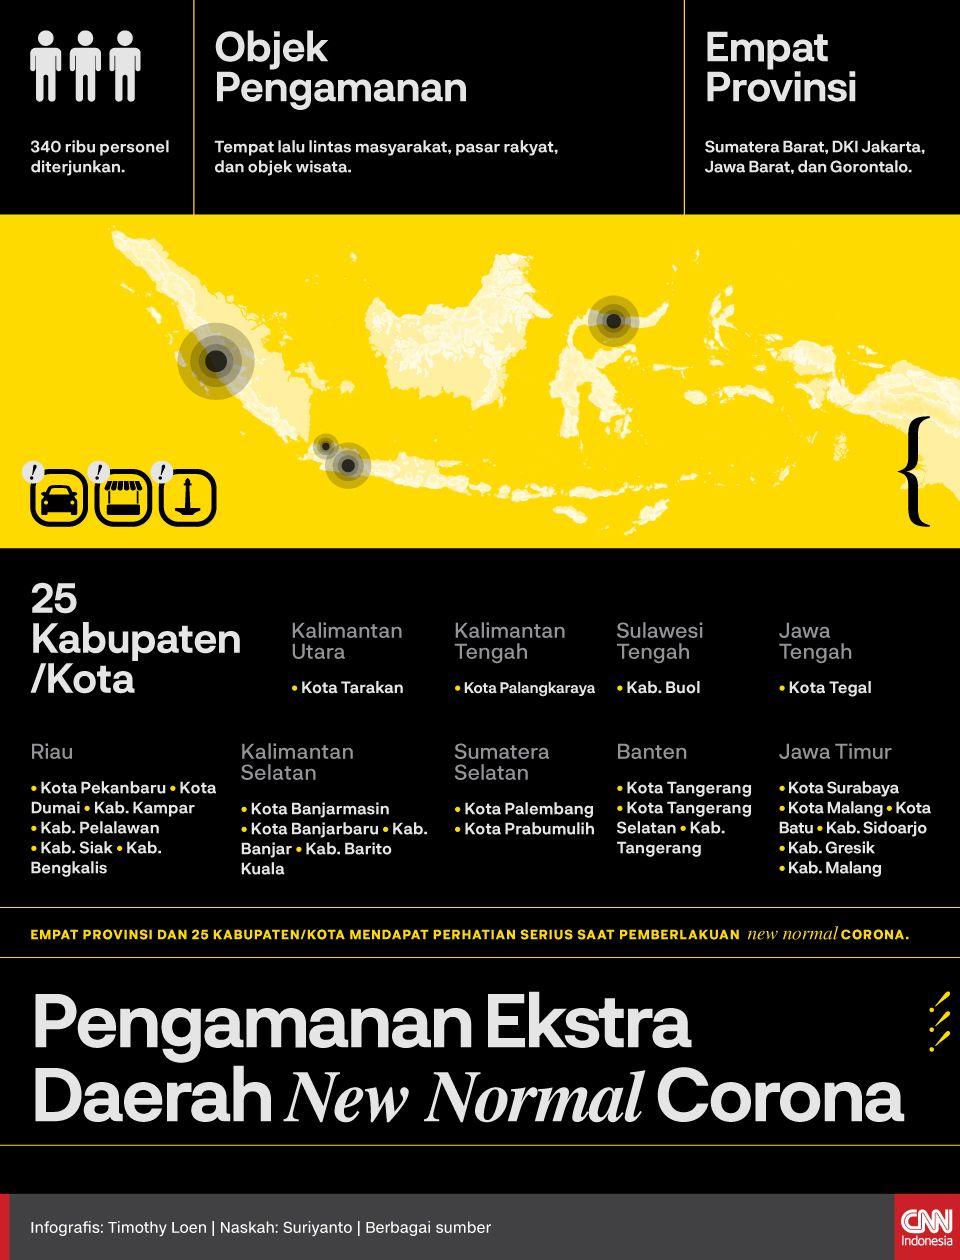 Infografis Pengamanan Ekstra Daerah New Normal Corona